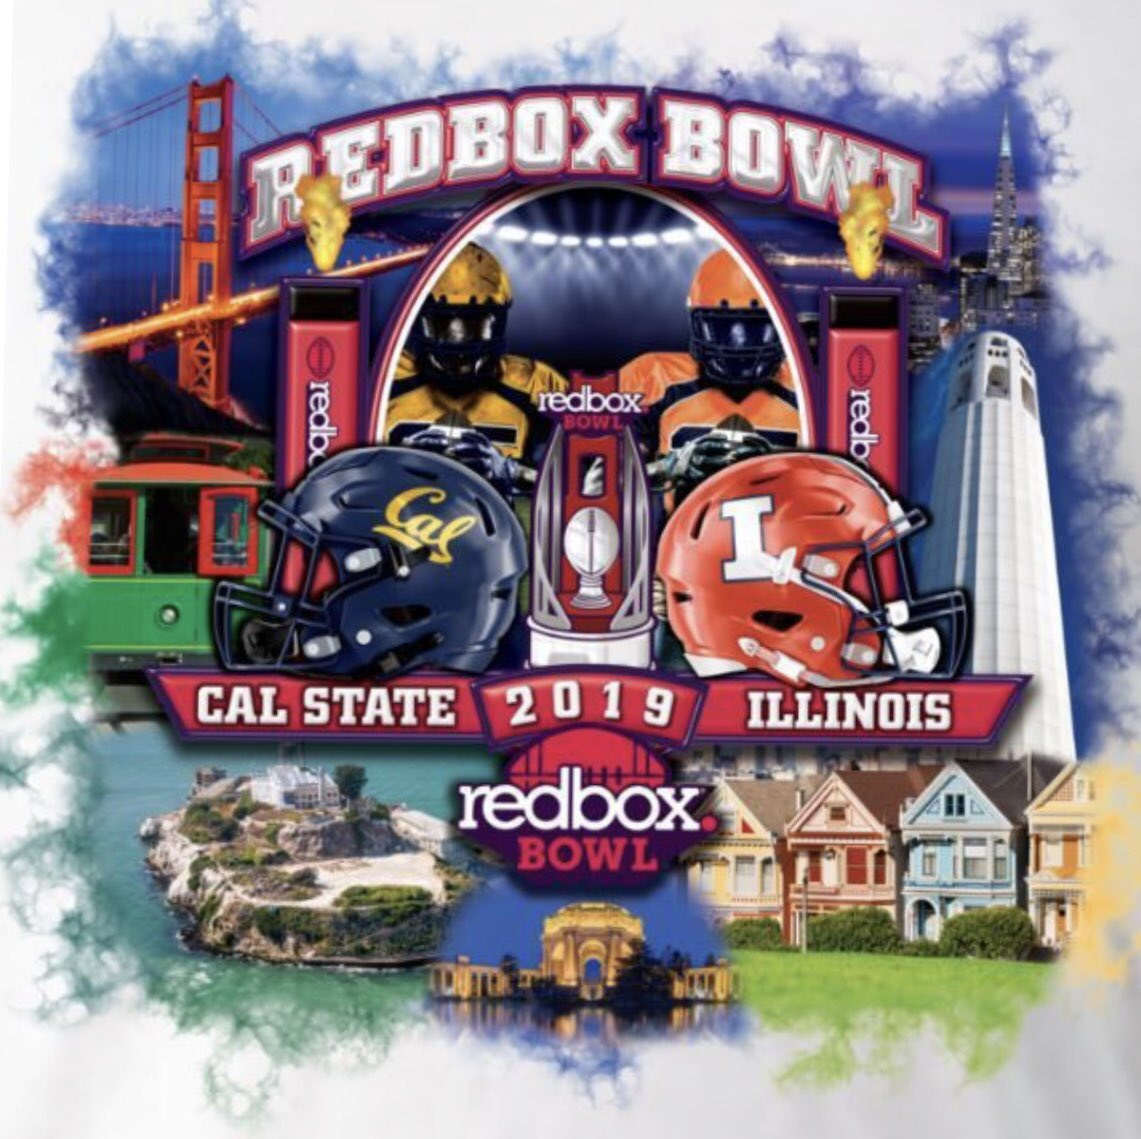 Cal football: Redbox Bowl makes embarrassing mistake on T-Shirts